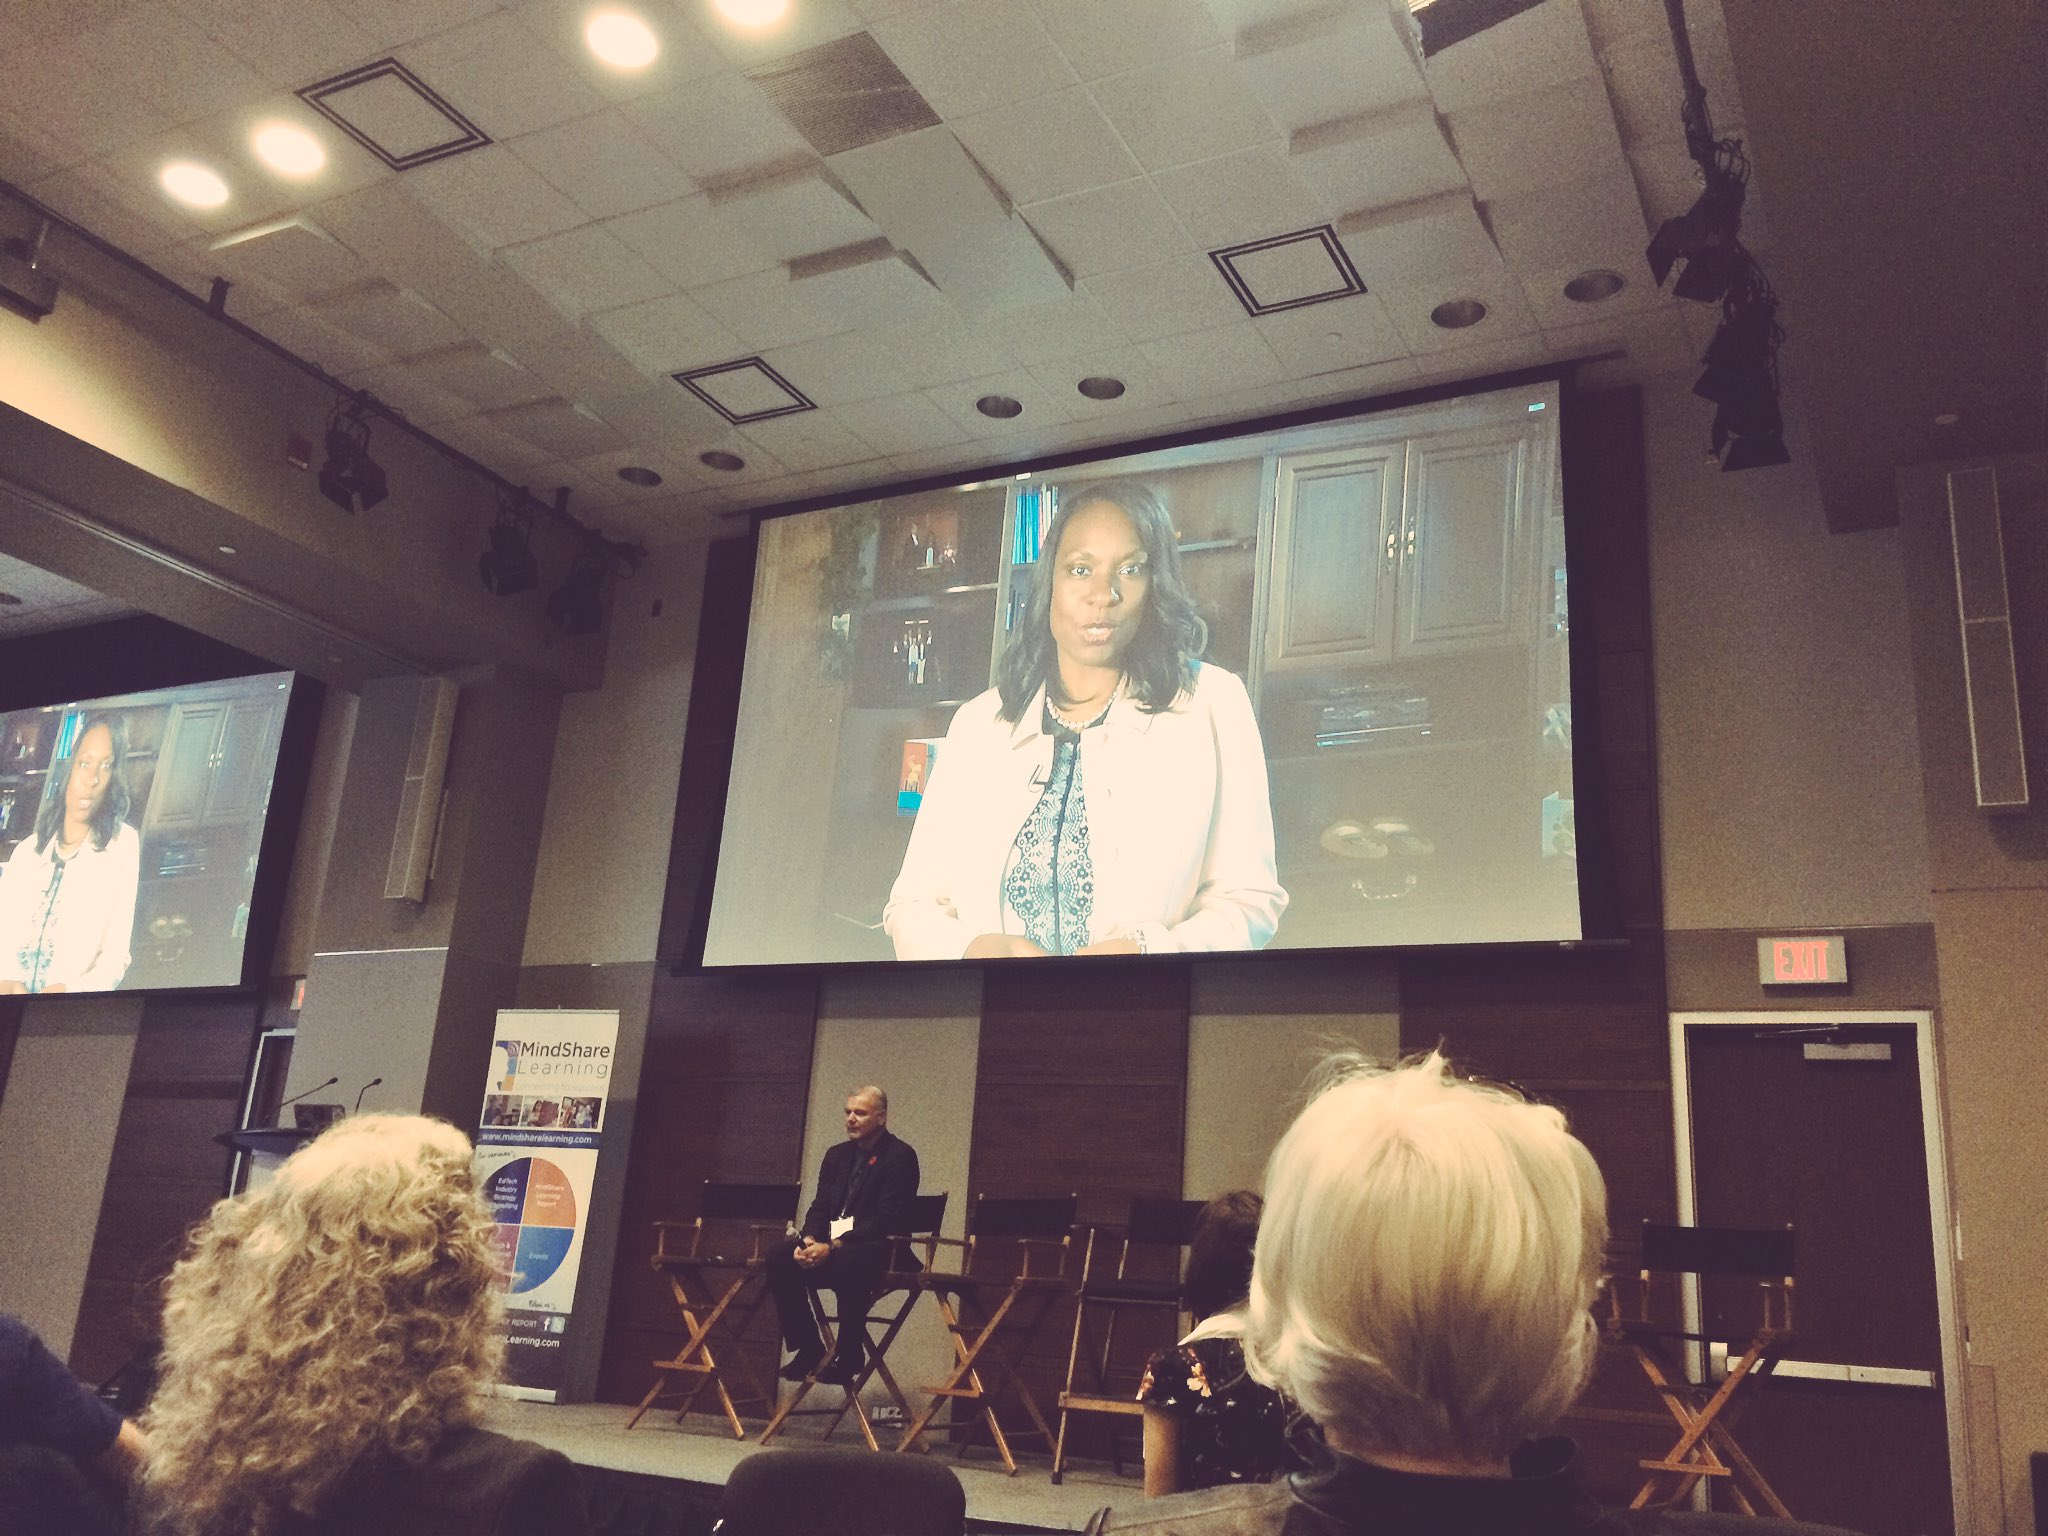 Love hearing how @MitzieHunter believes how character will set students up for life long success #cdnedtech16 https://t.co/dZDZmzkumU